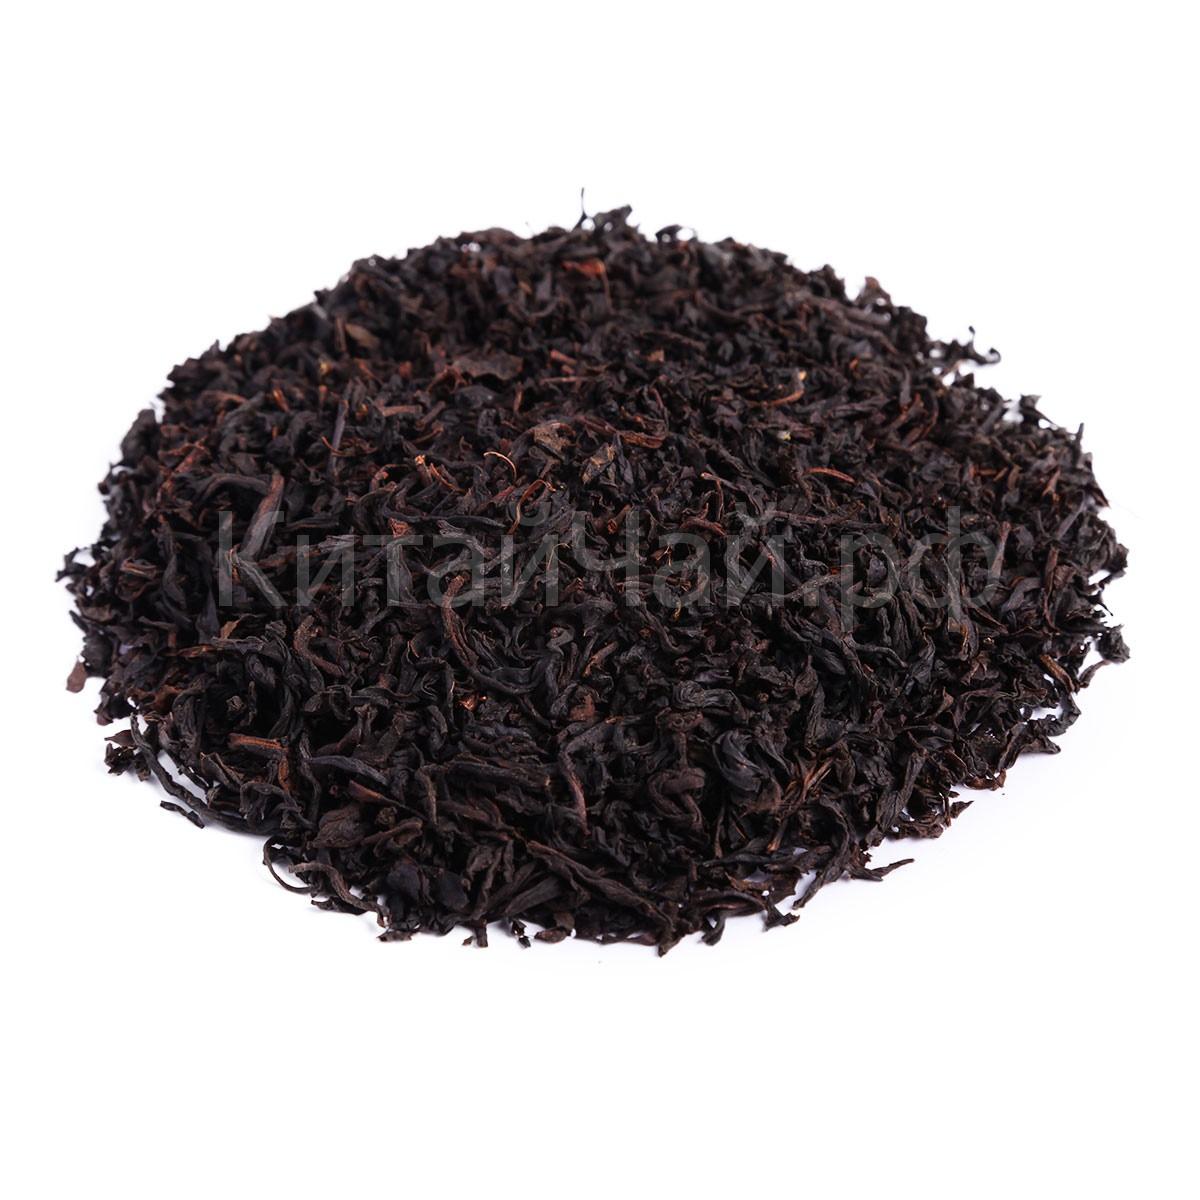 Чай черный - Эрл Грей №3 - 100 гр